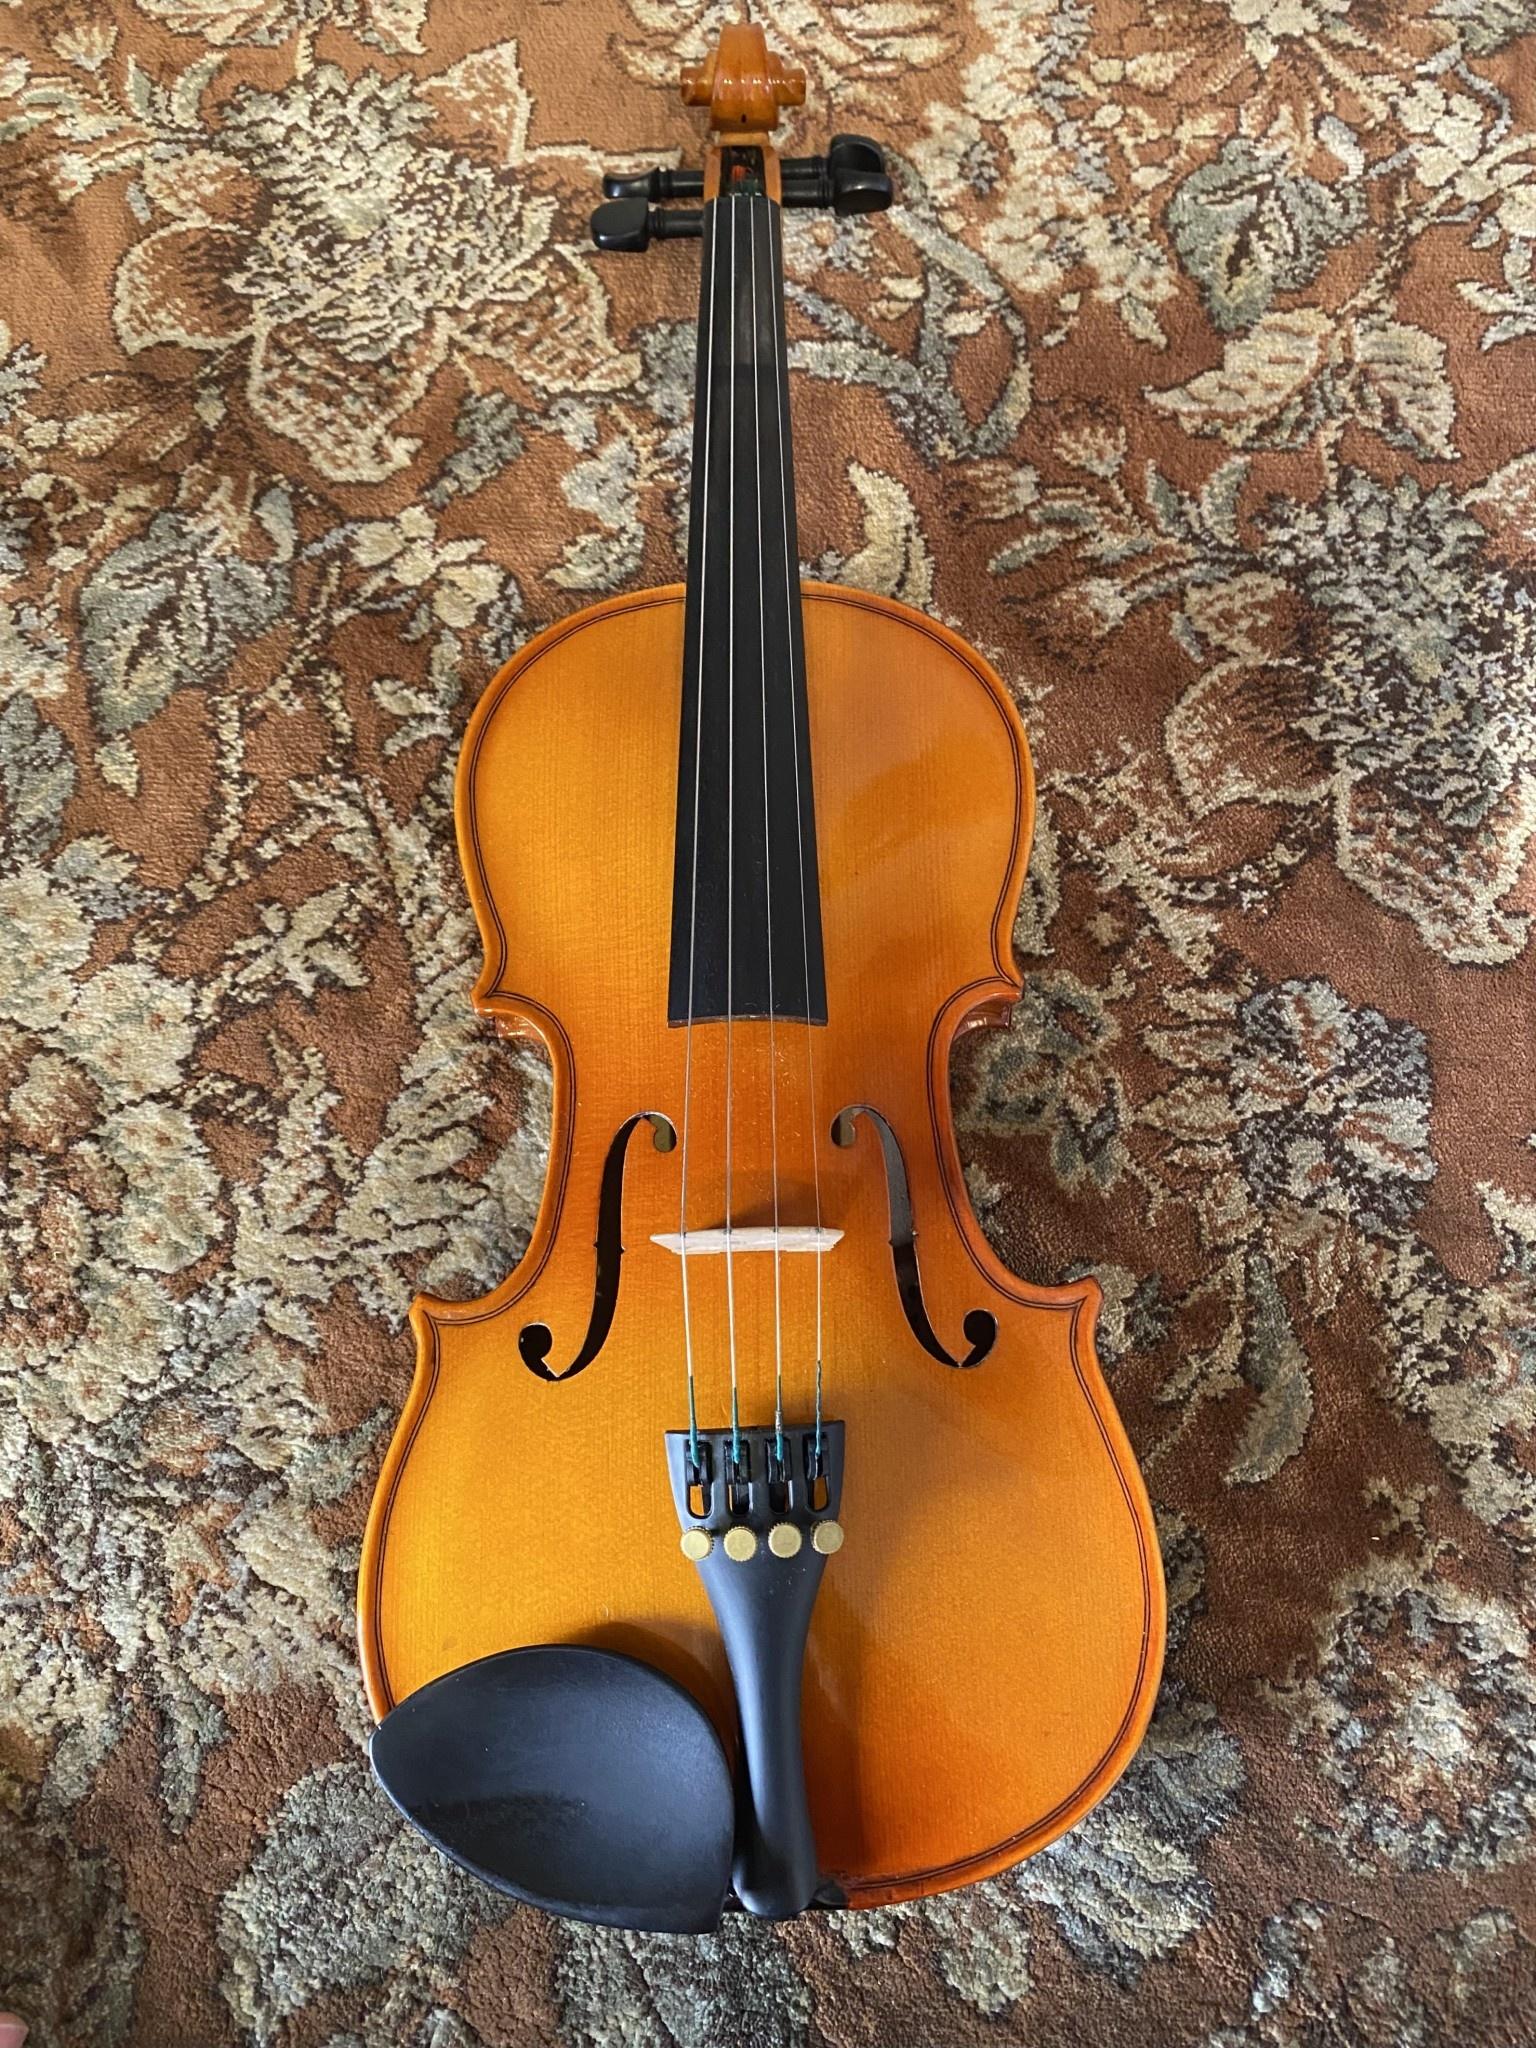 1/2 Serafina violin outfit, used